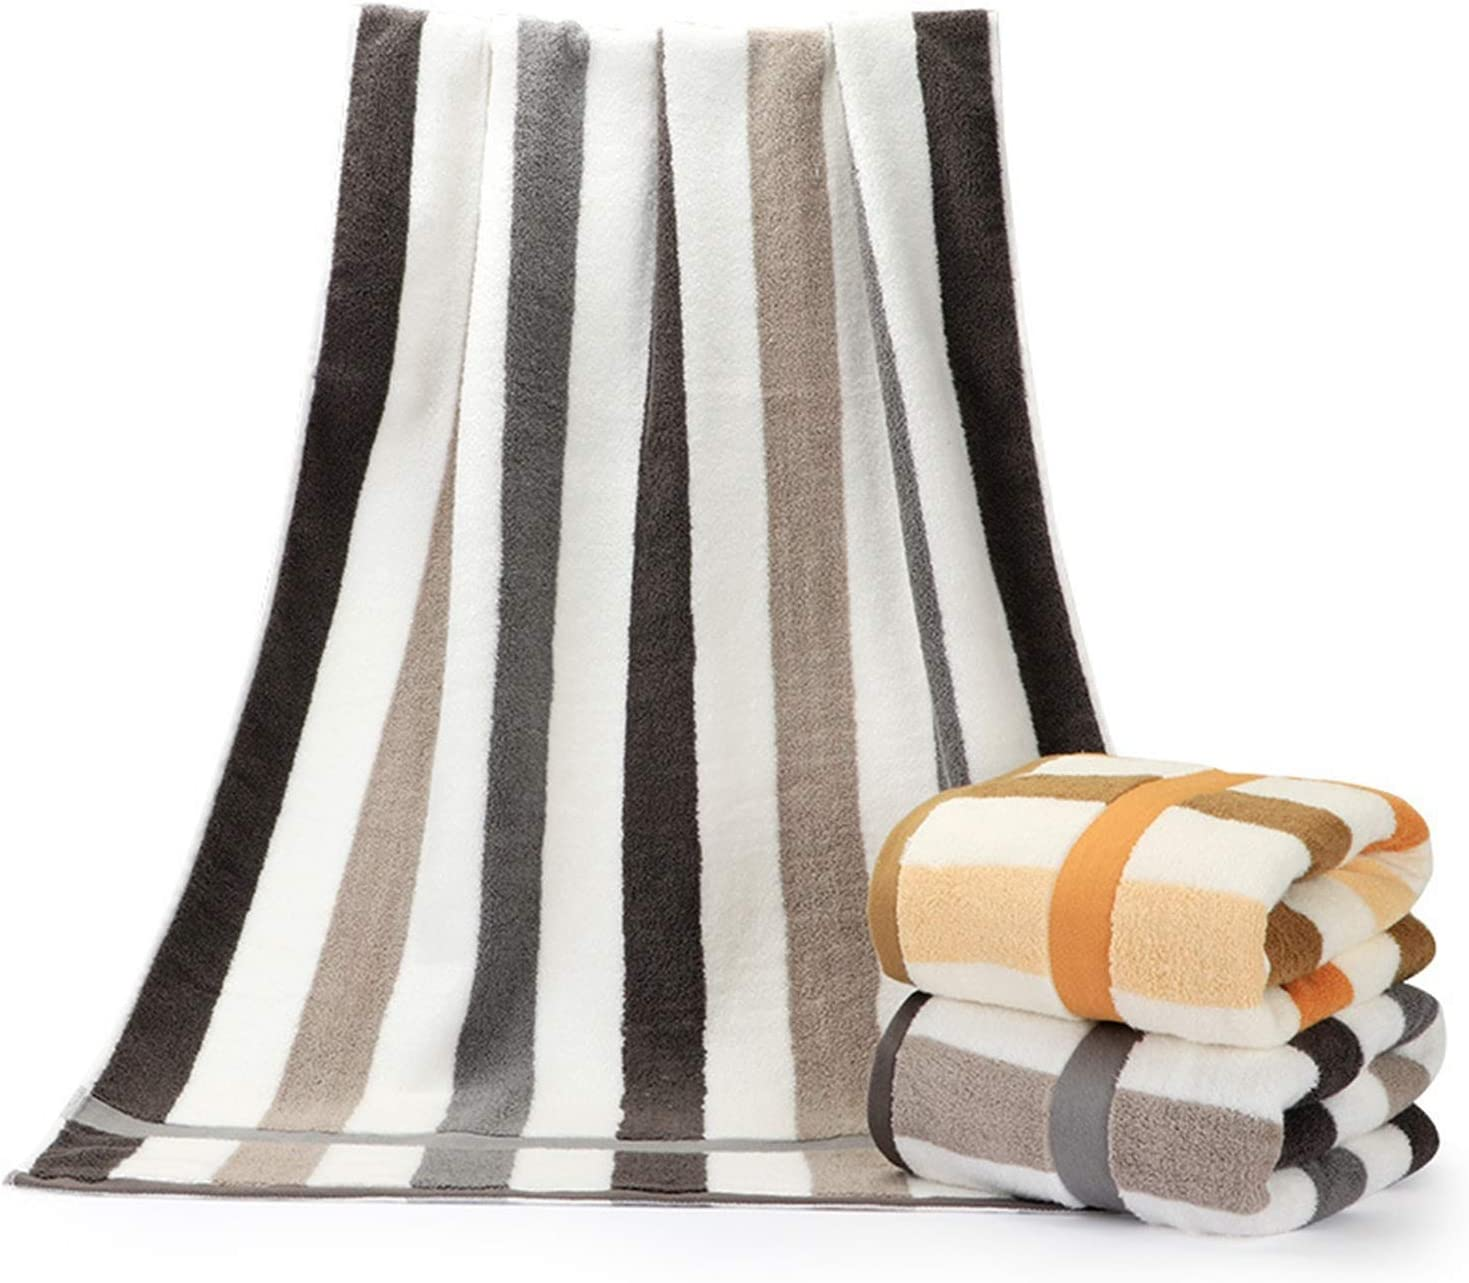 Jgzwlkj Bathroom Towels 100% Cotton Regular dealer Bath Now on sale 70140 cm Towel Terry So